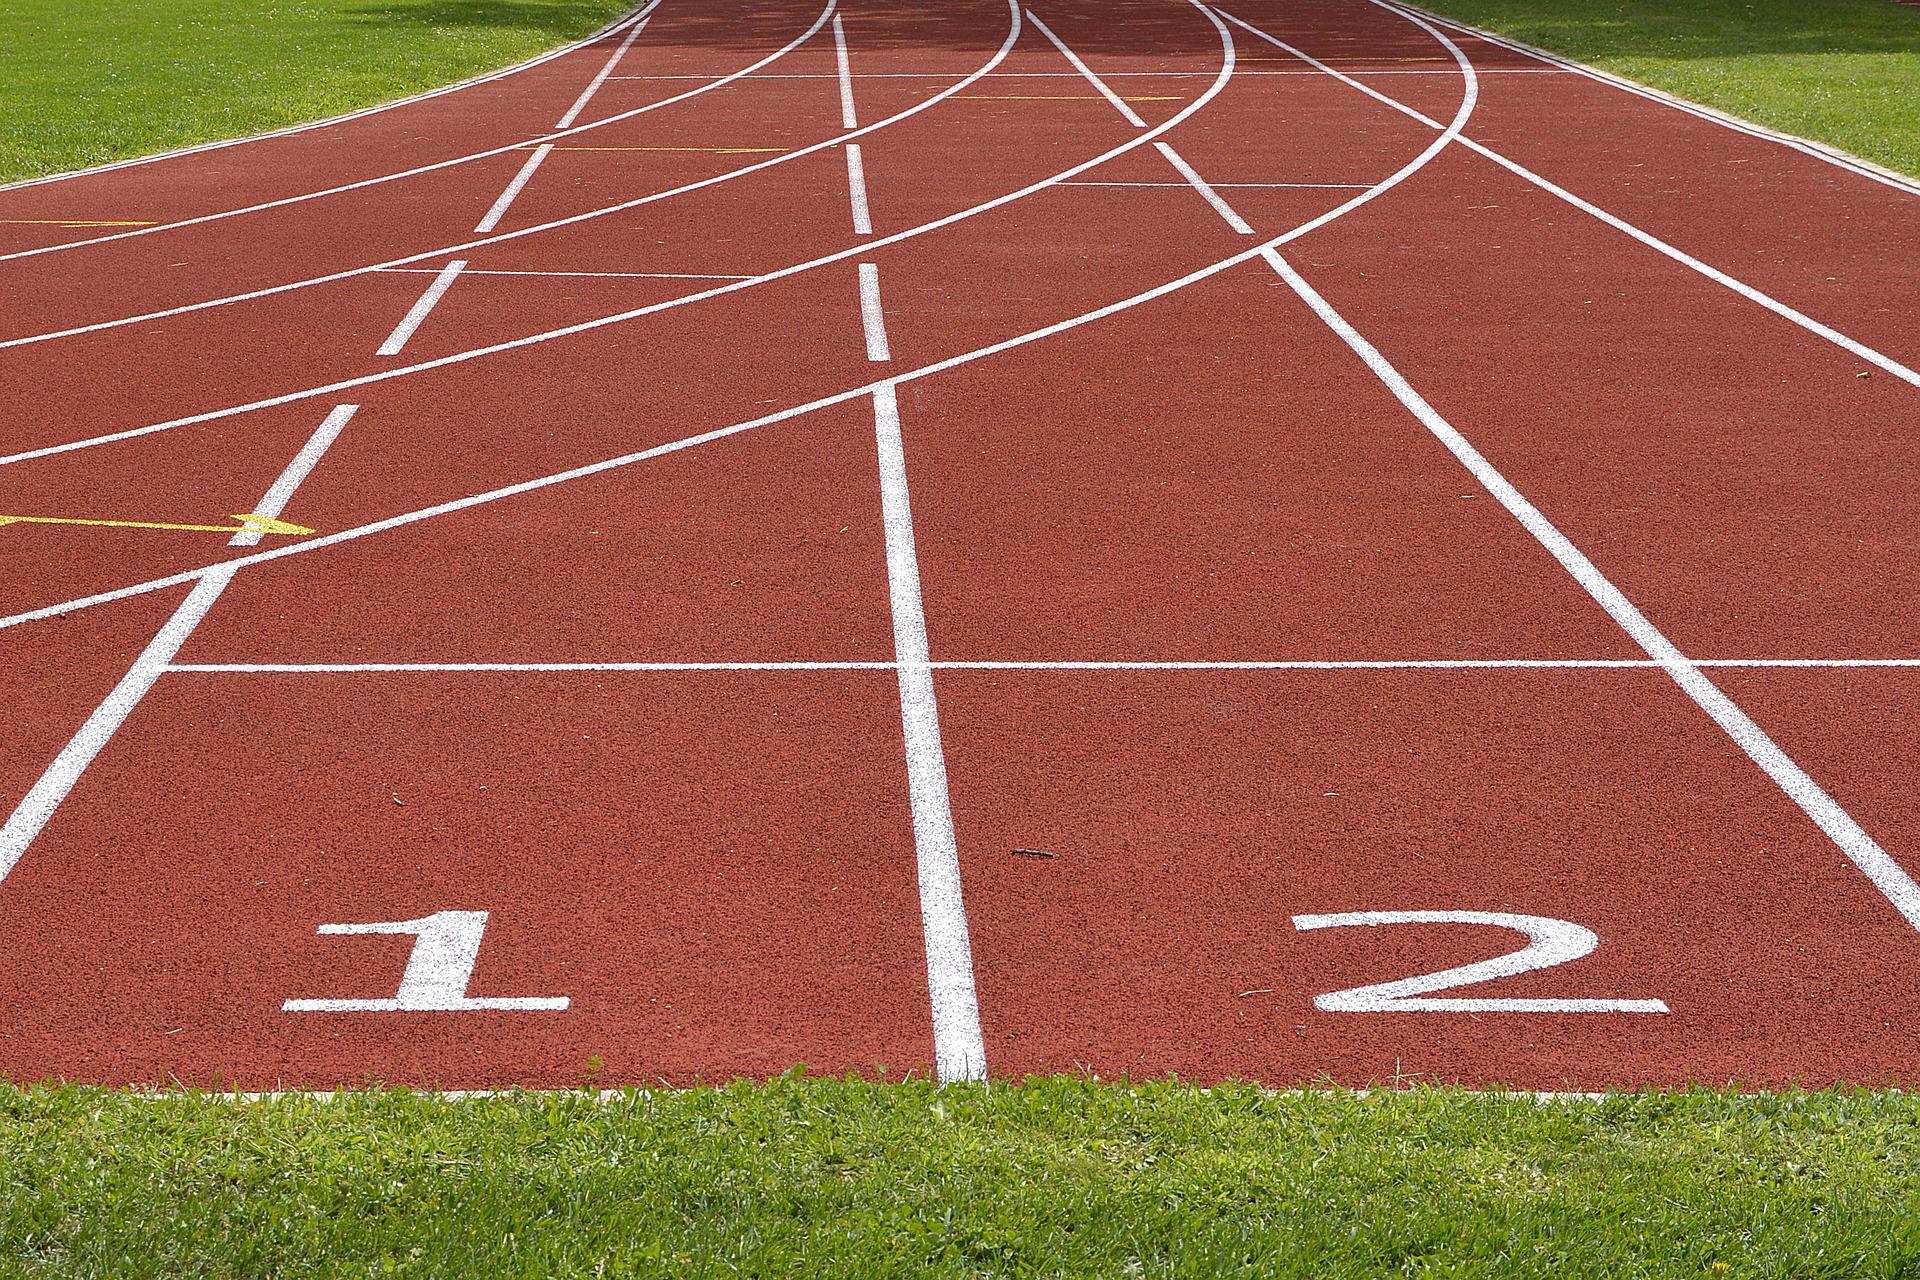 La costituzione di una Associazione sportiva dilettantistica